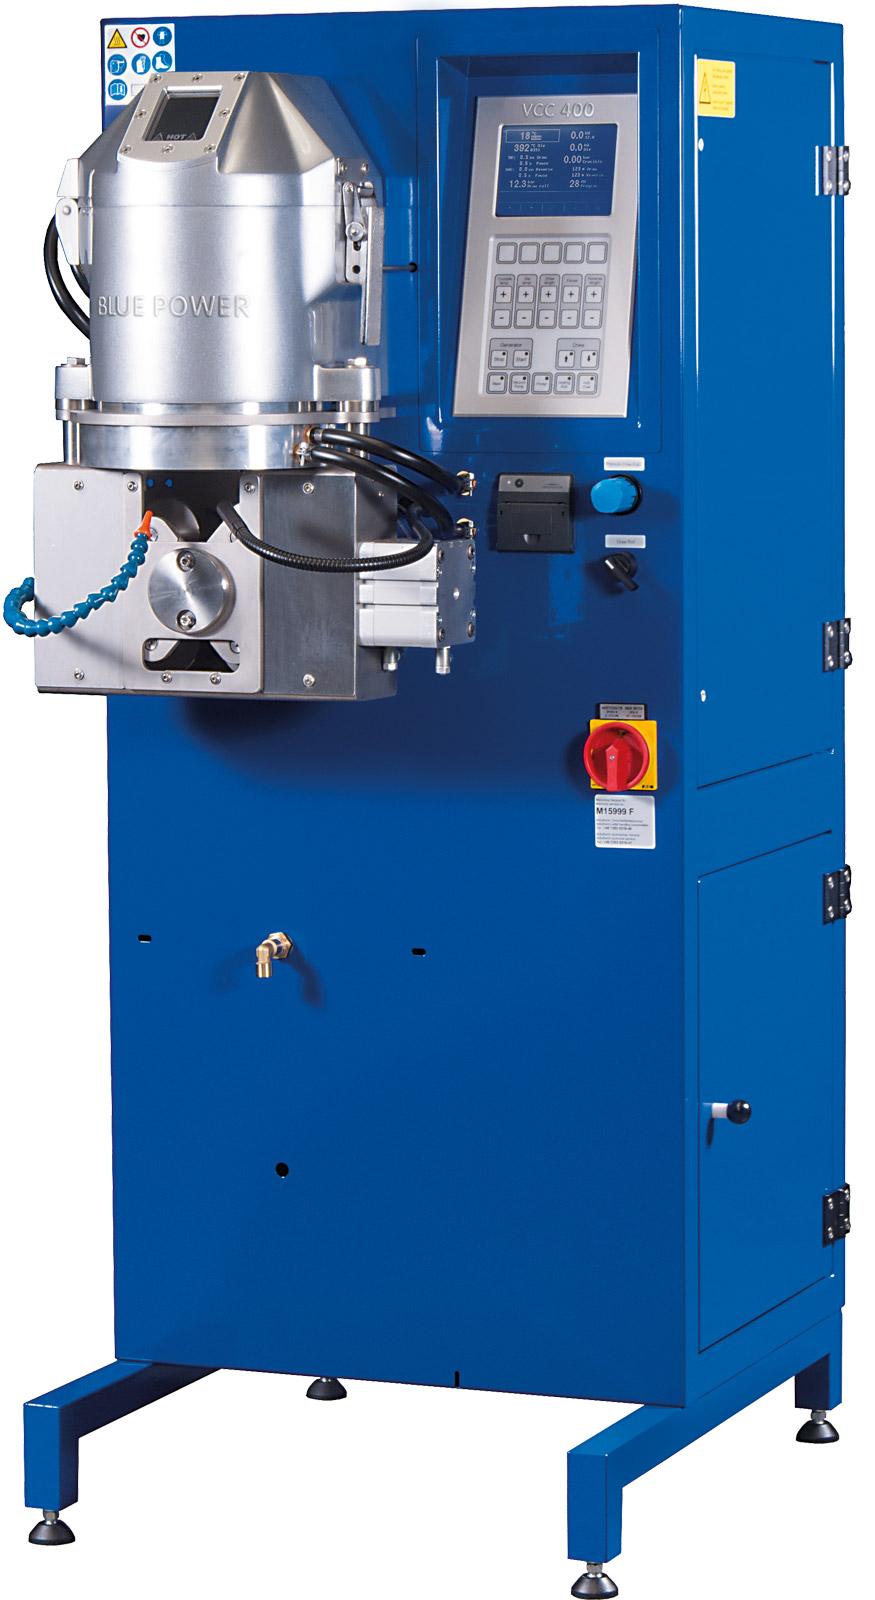 Stranggießanlage CC 400 / VCC 400